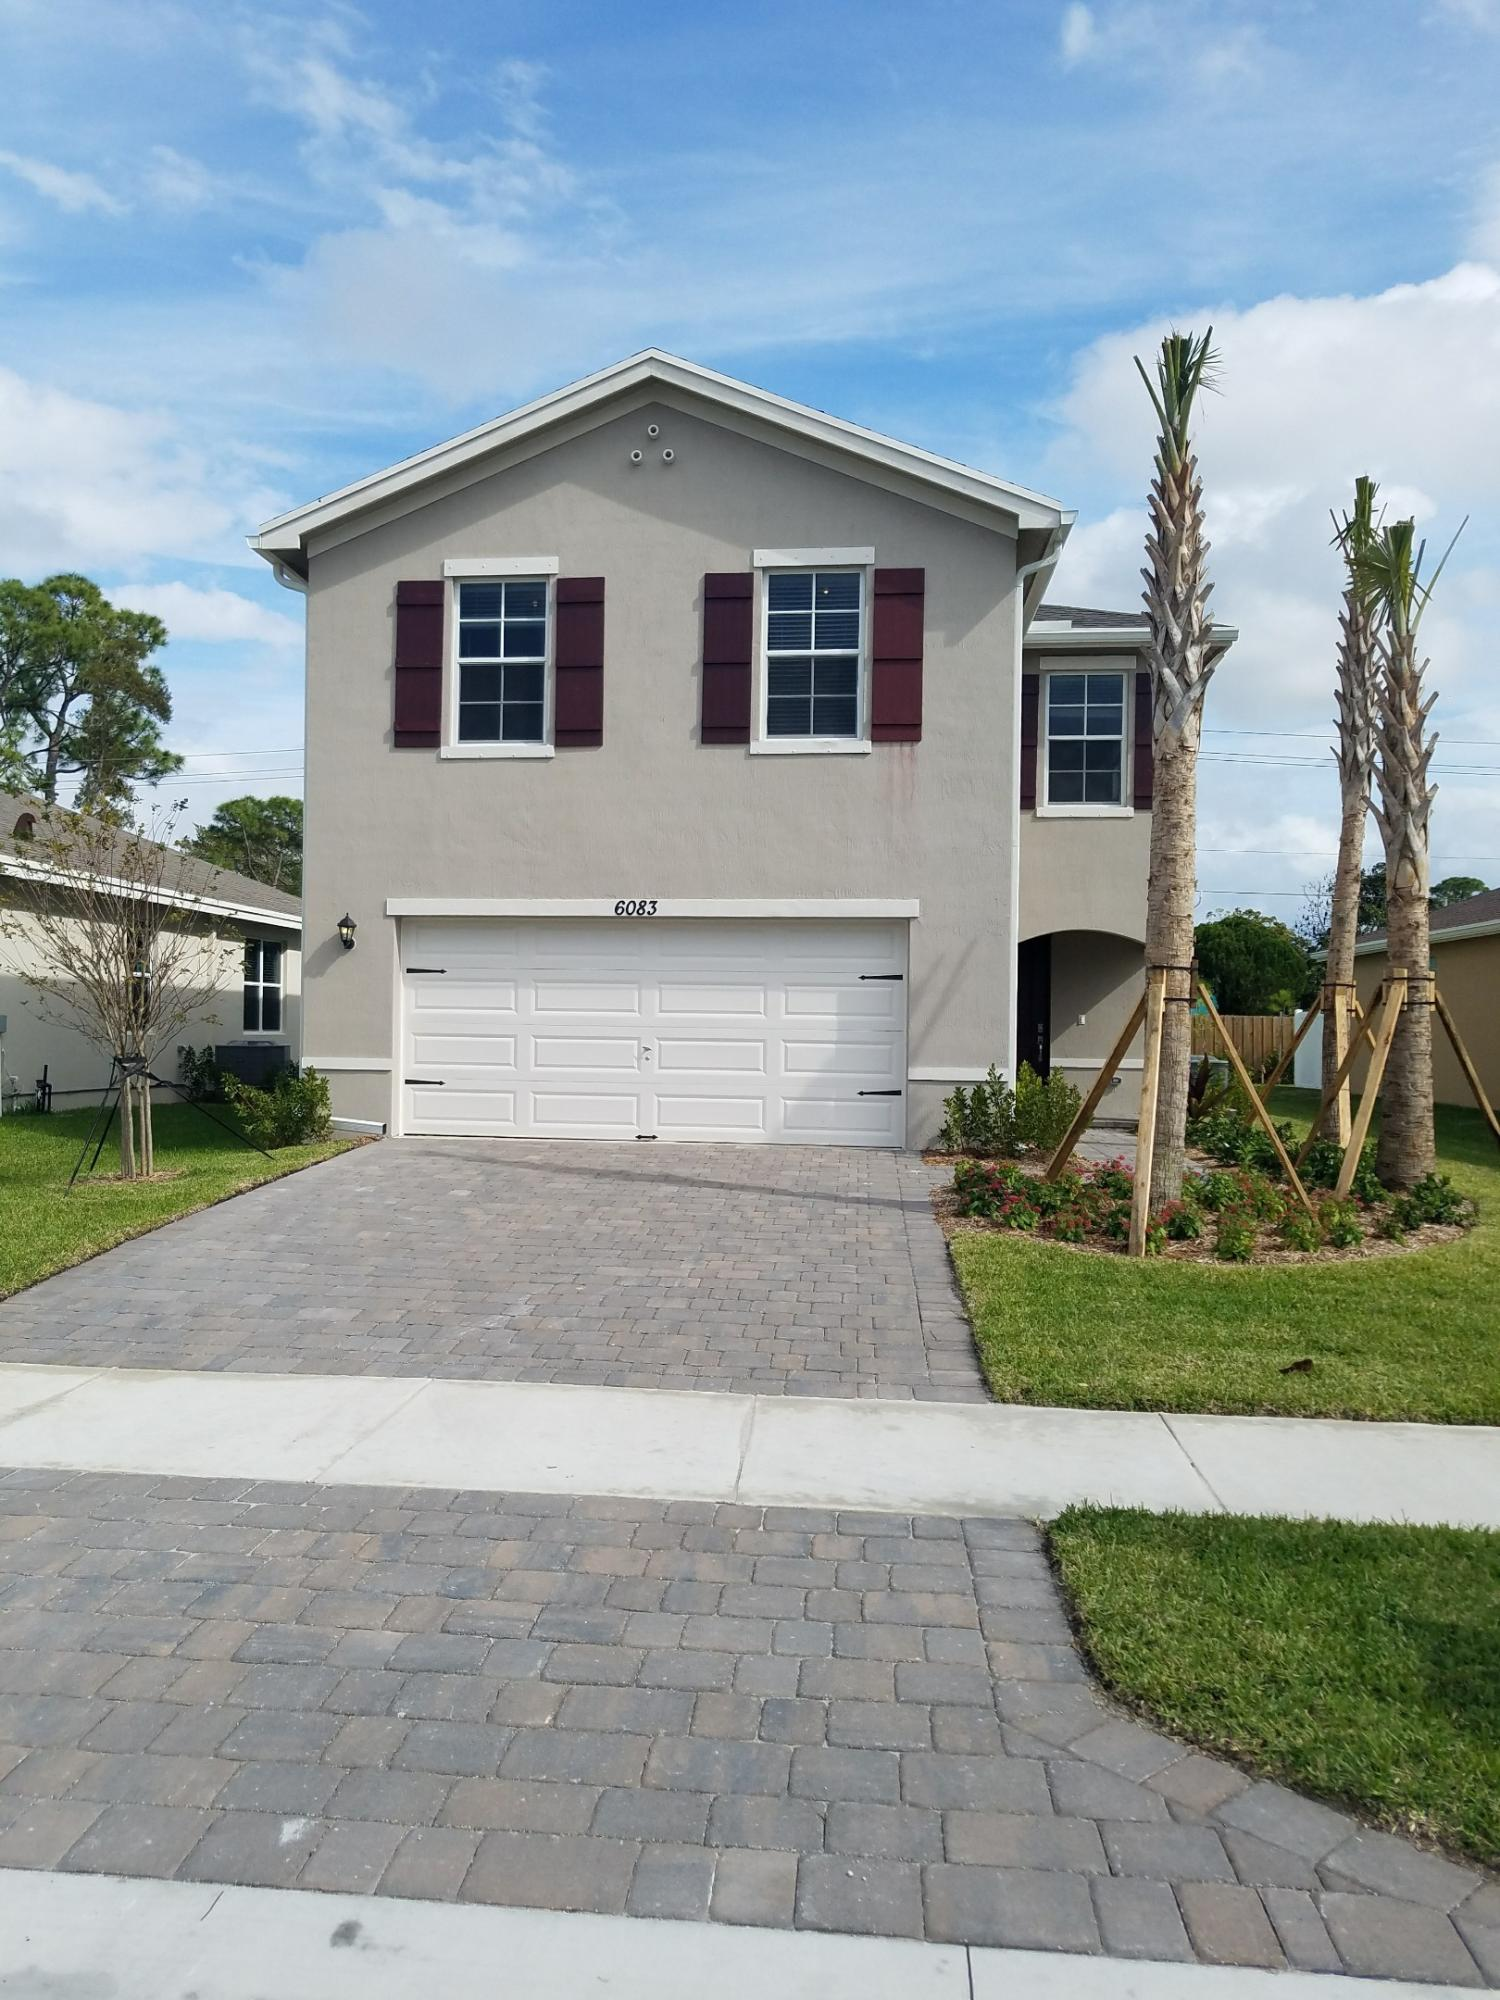 Photo of 6083 Wildfire West Palm Beach FL 33415 MLS RX-10454483